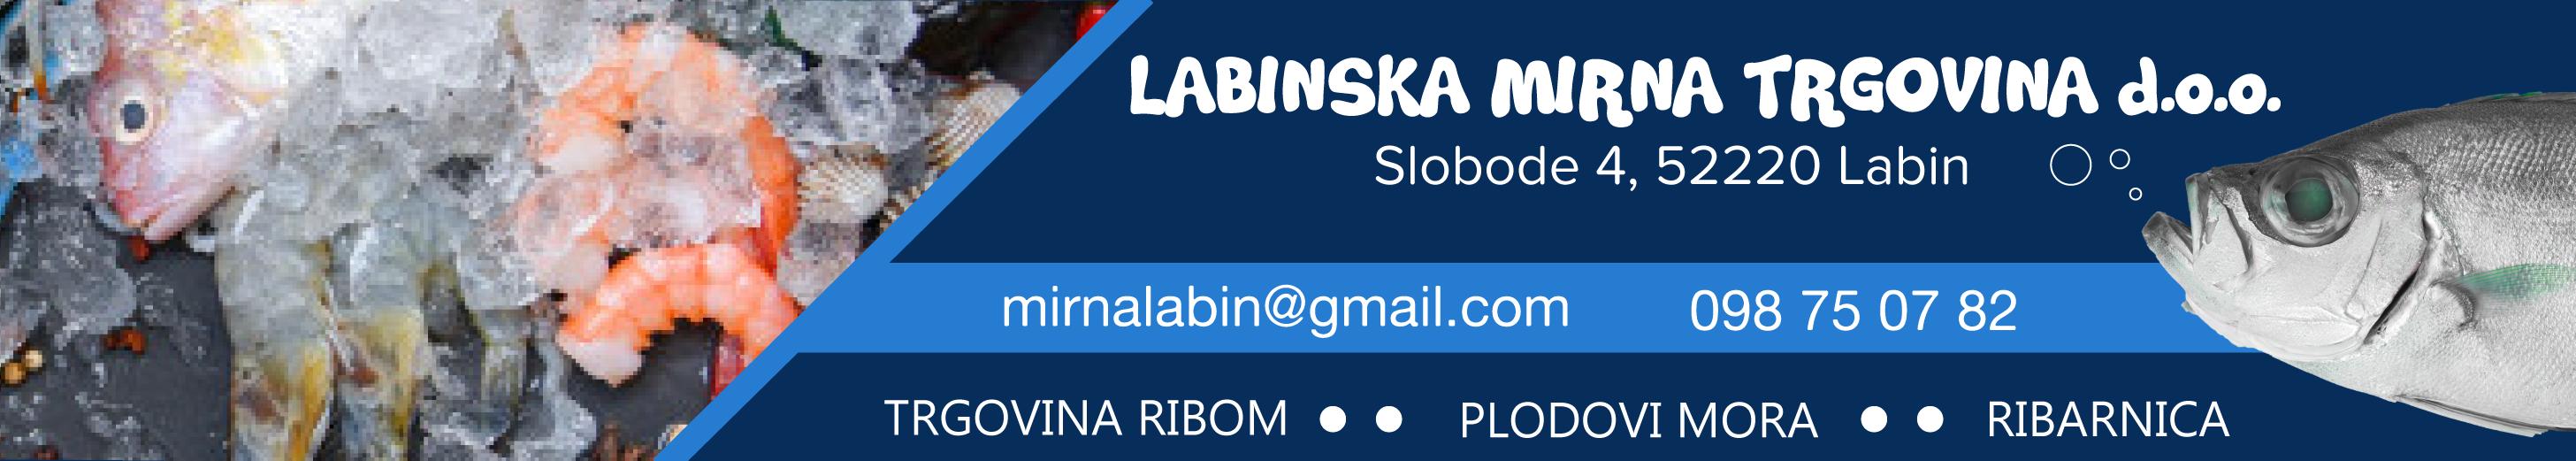 labinska-mirna-trgovina@4x